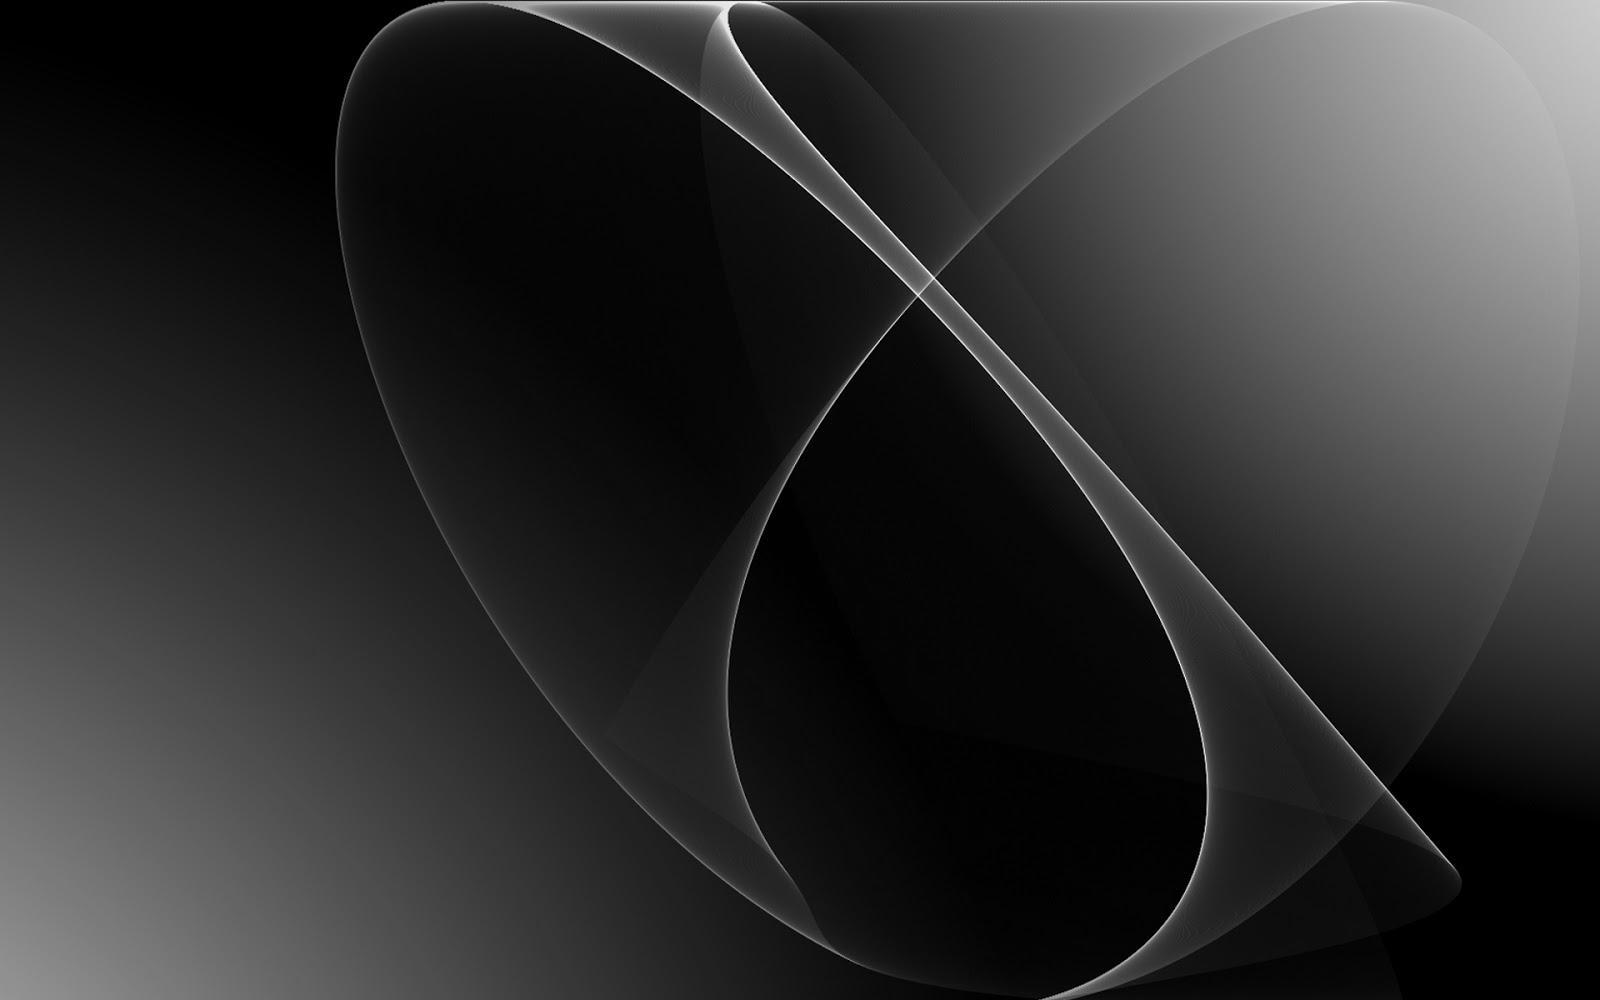 White And Black Wallpaper Designs 17 Background: Siyah Beyaz HD Resimler 2013 - Duvar Kağıtları